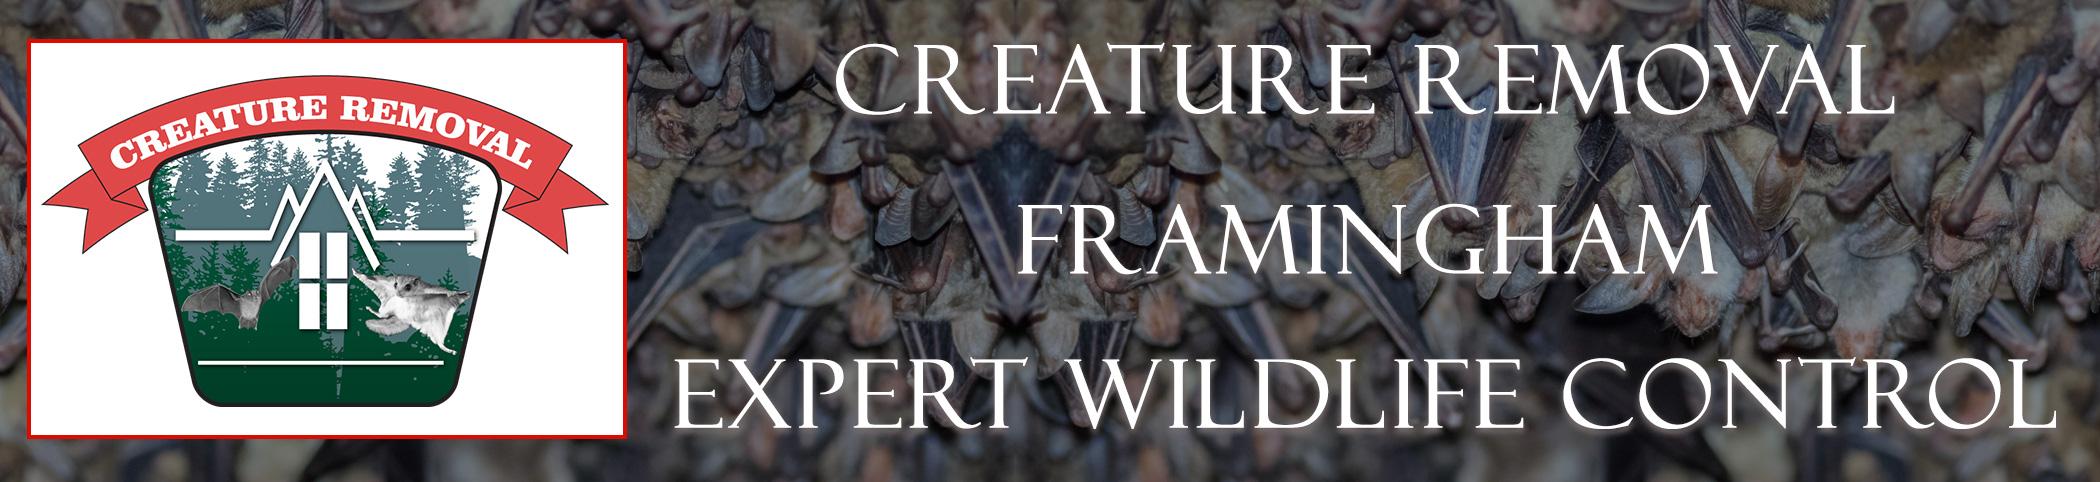 framingham-mass-creature-removal-header